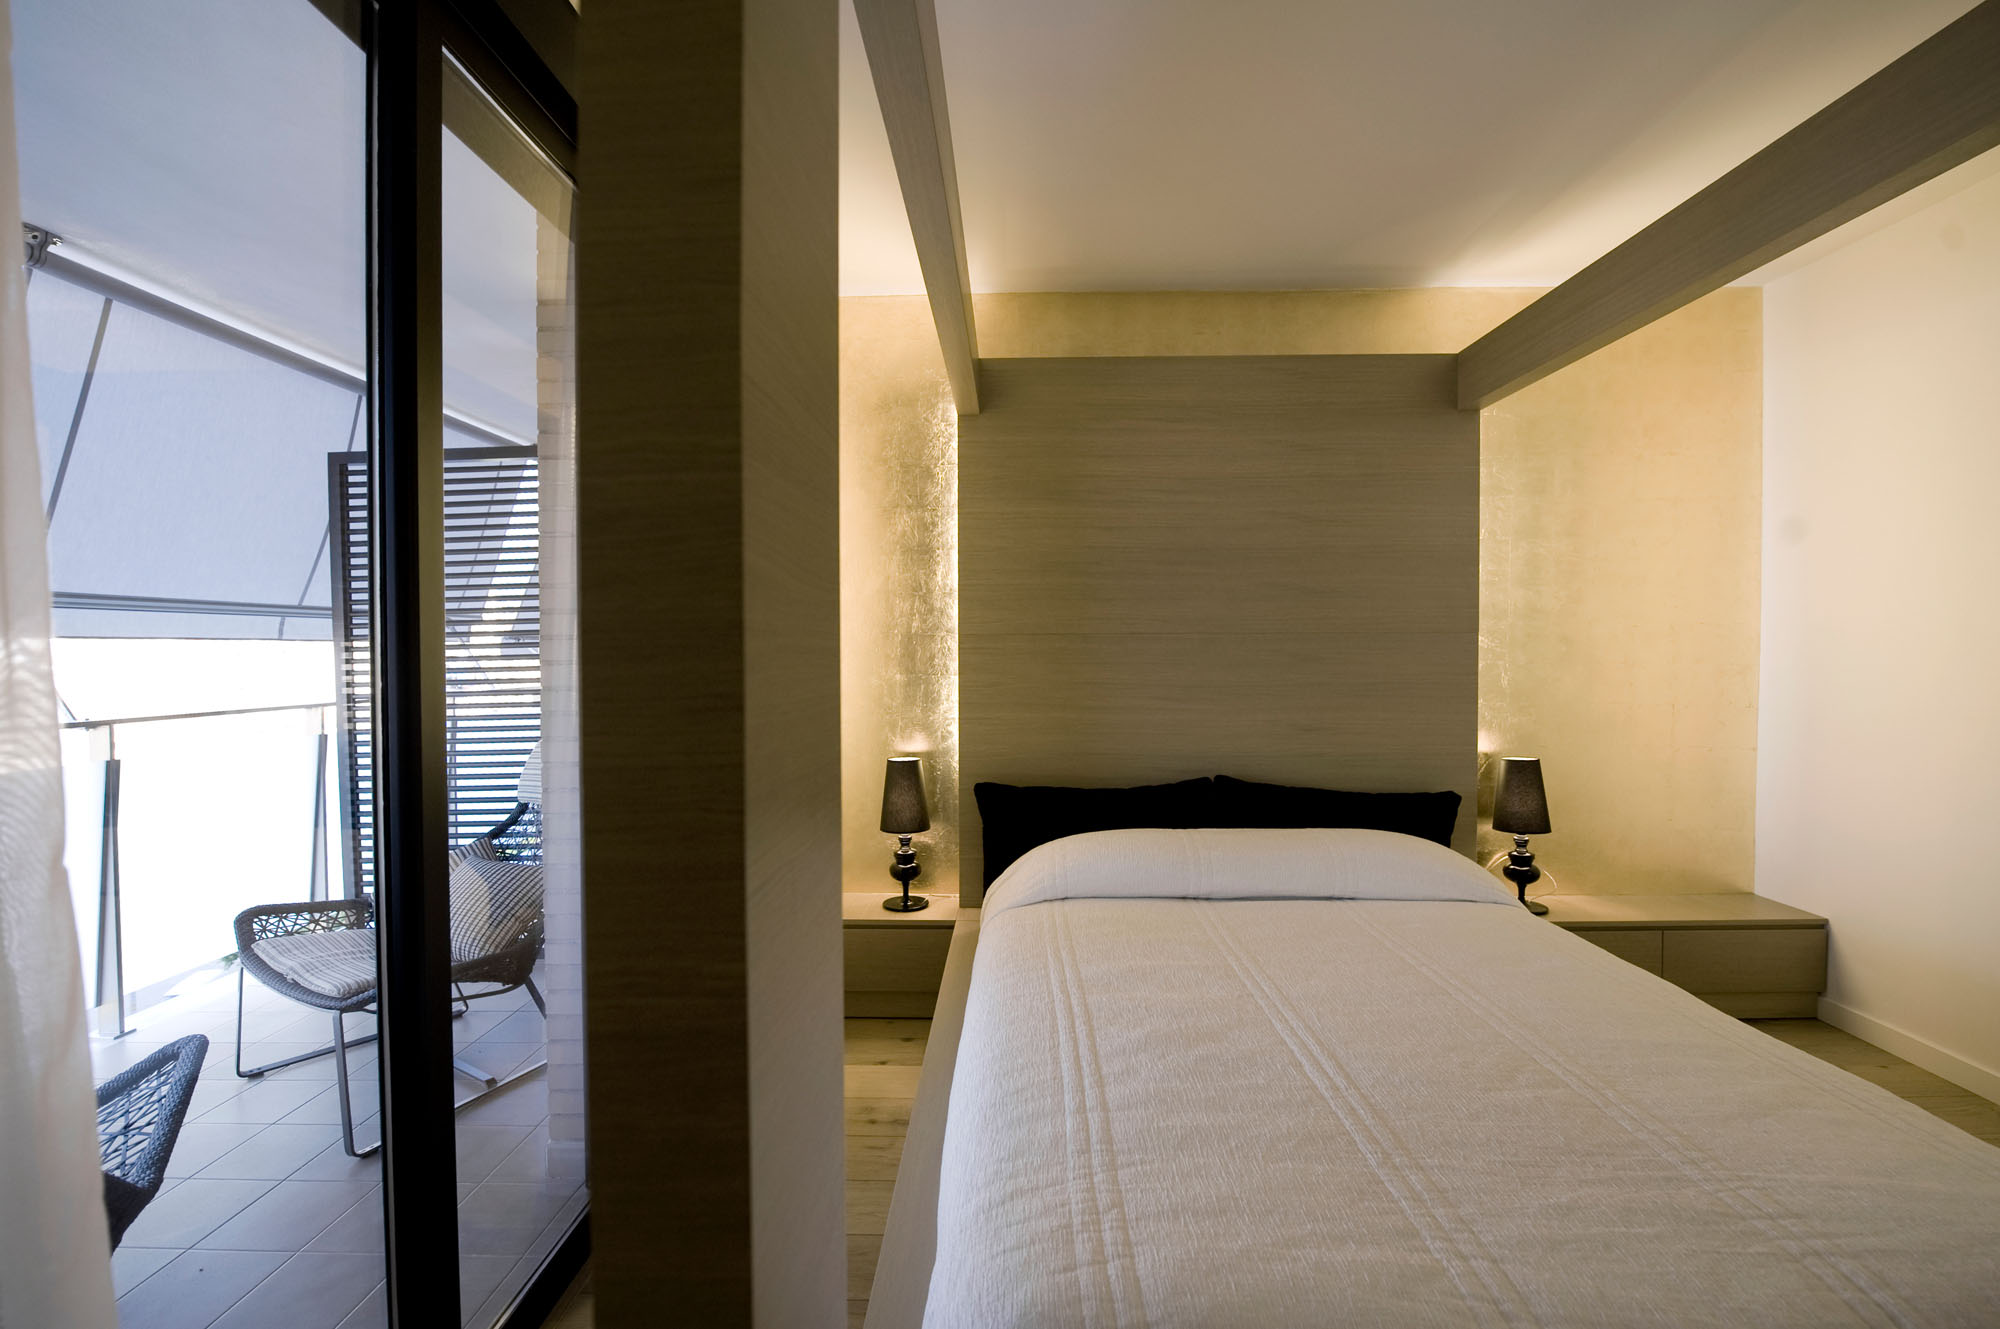 HI-MACS Doble Dueto Apartment by Cuartopensante (32)